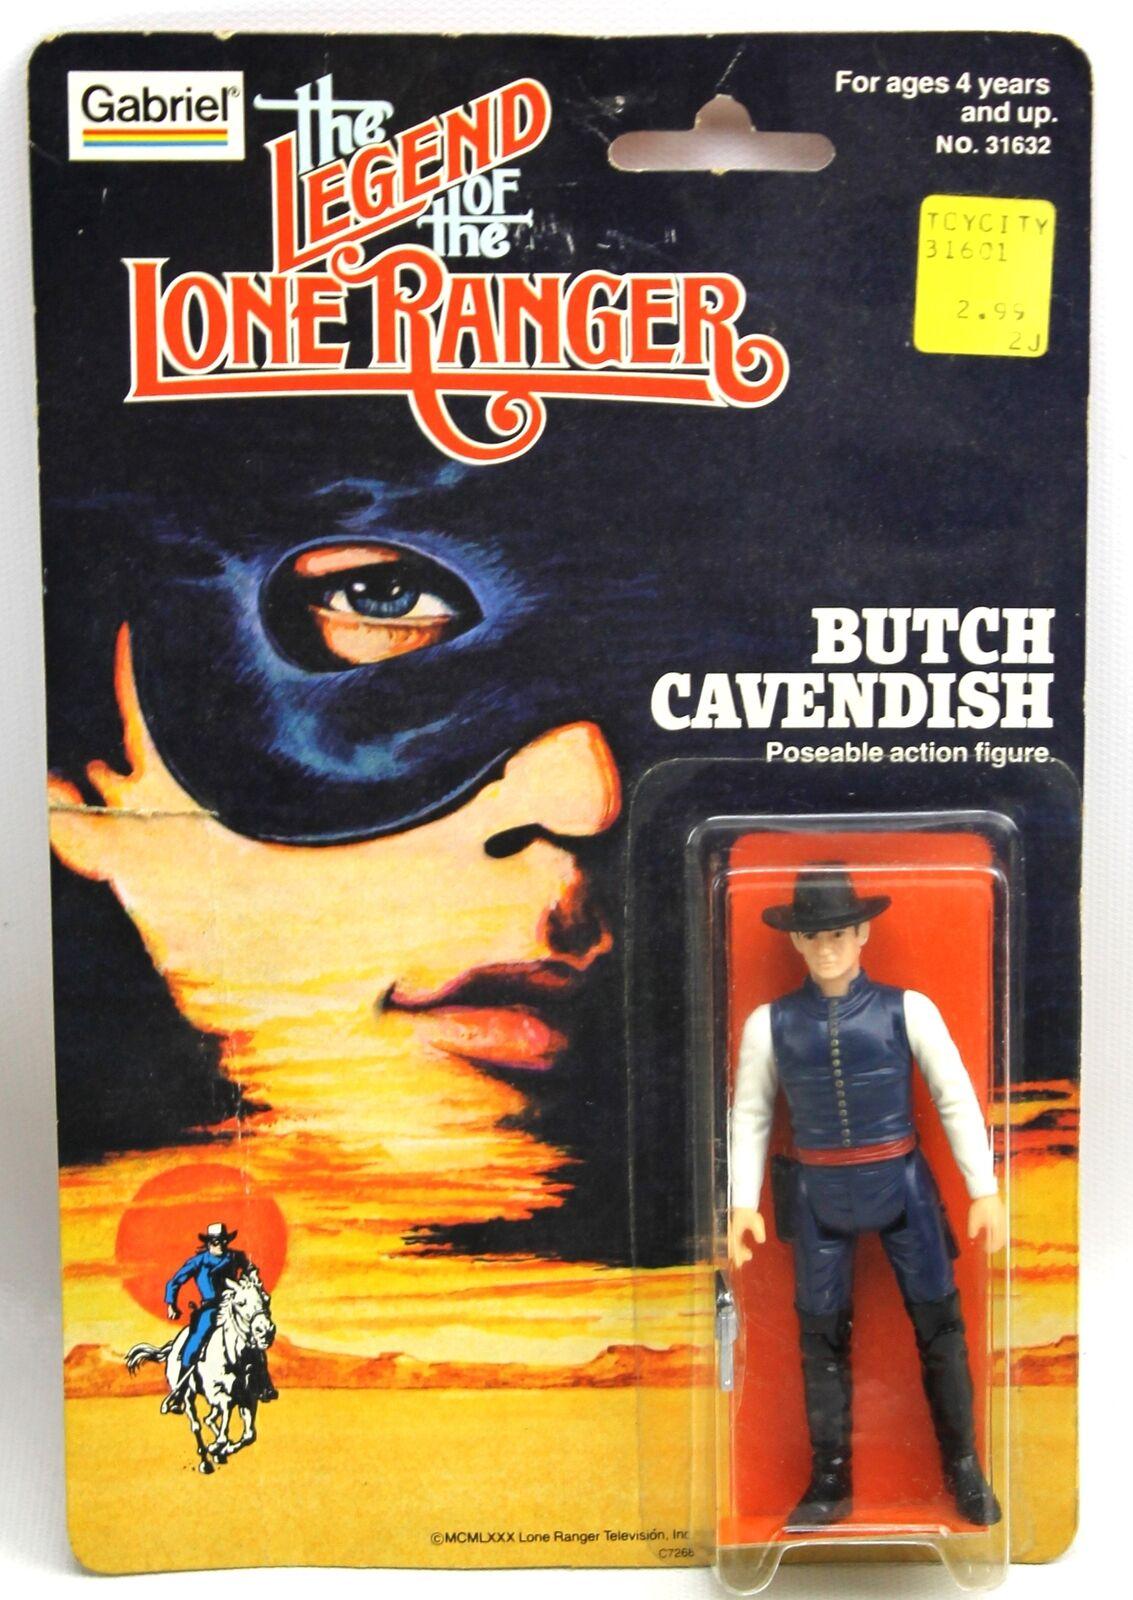 Nuevo 1980 Butch Cavendish Legend of the Lone Ranger muñeco Gabriel